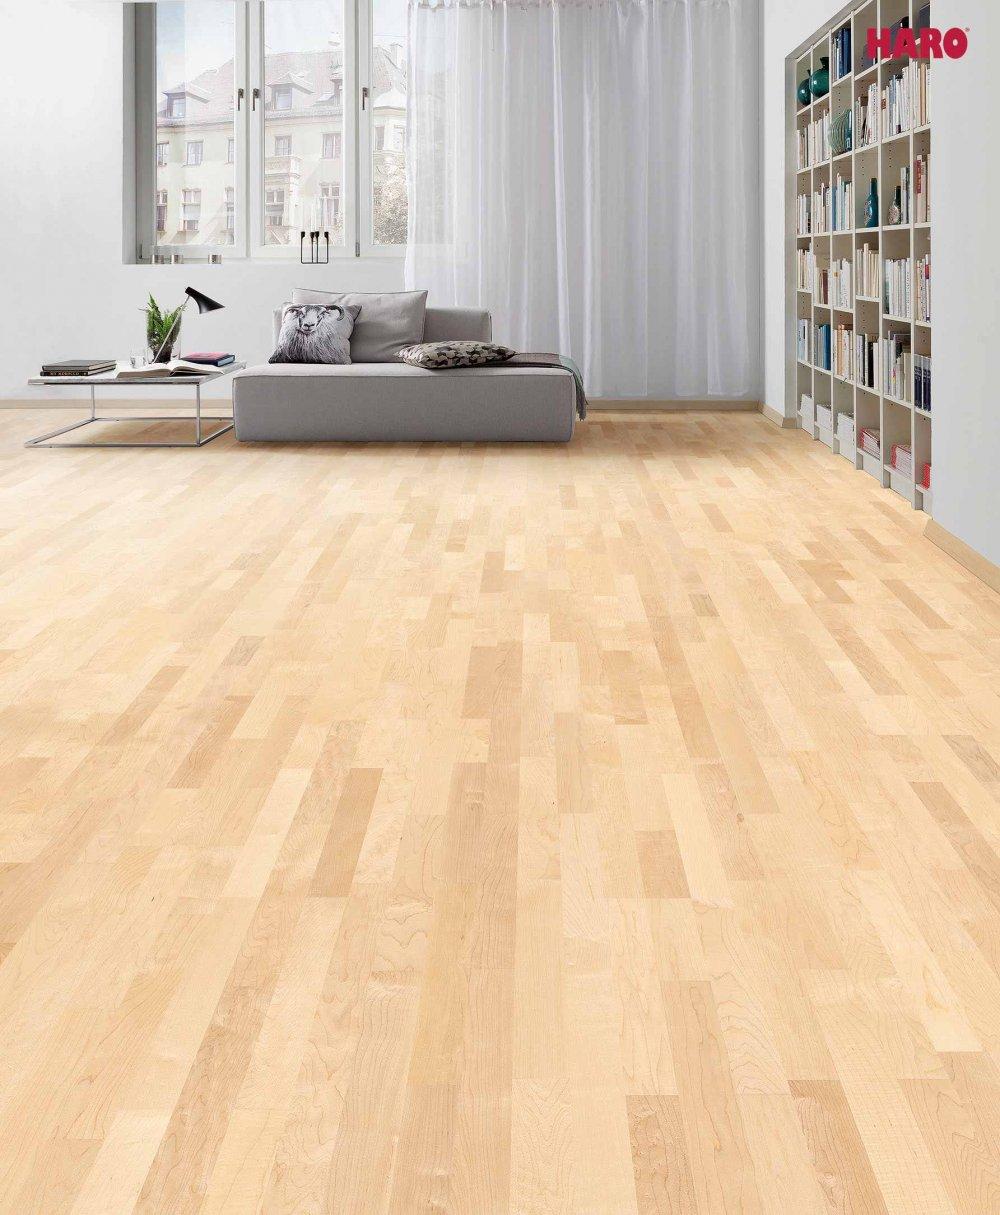 523809 haro parkett 3 stab schiffsboden 4000 canadischer ahorn trend lackiert. Black Bedroom Furniture Sets. Home Design Ideas